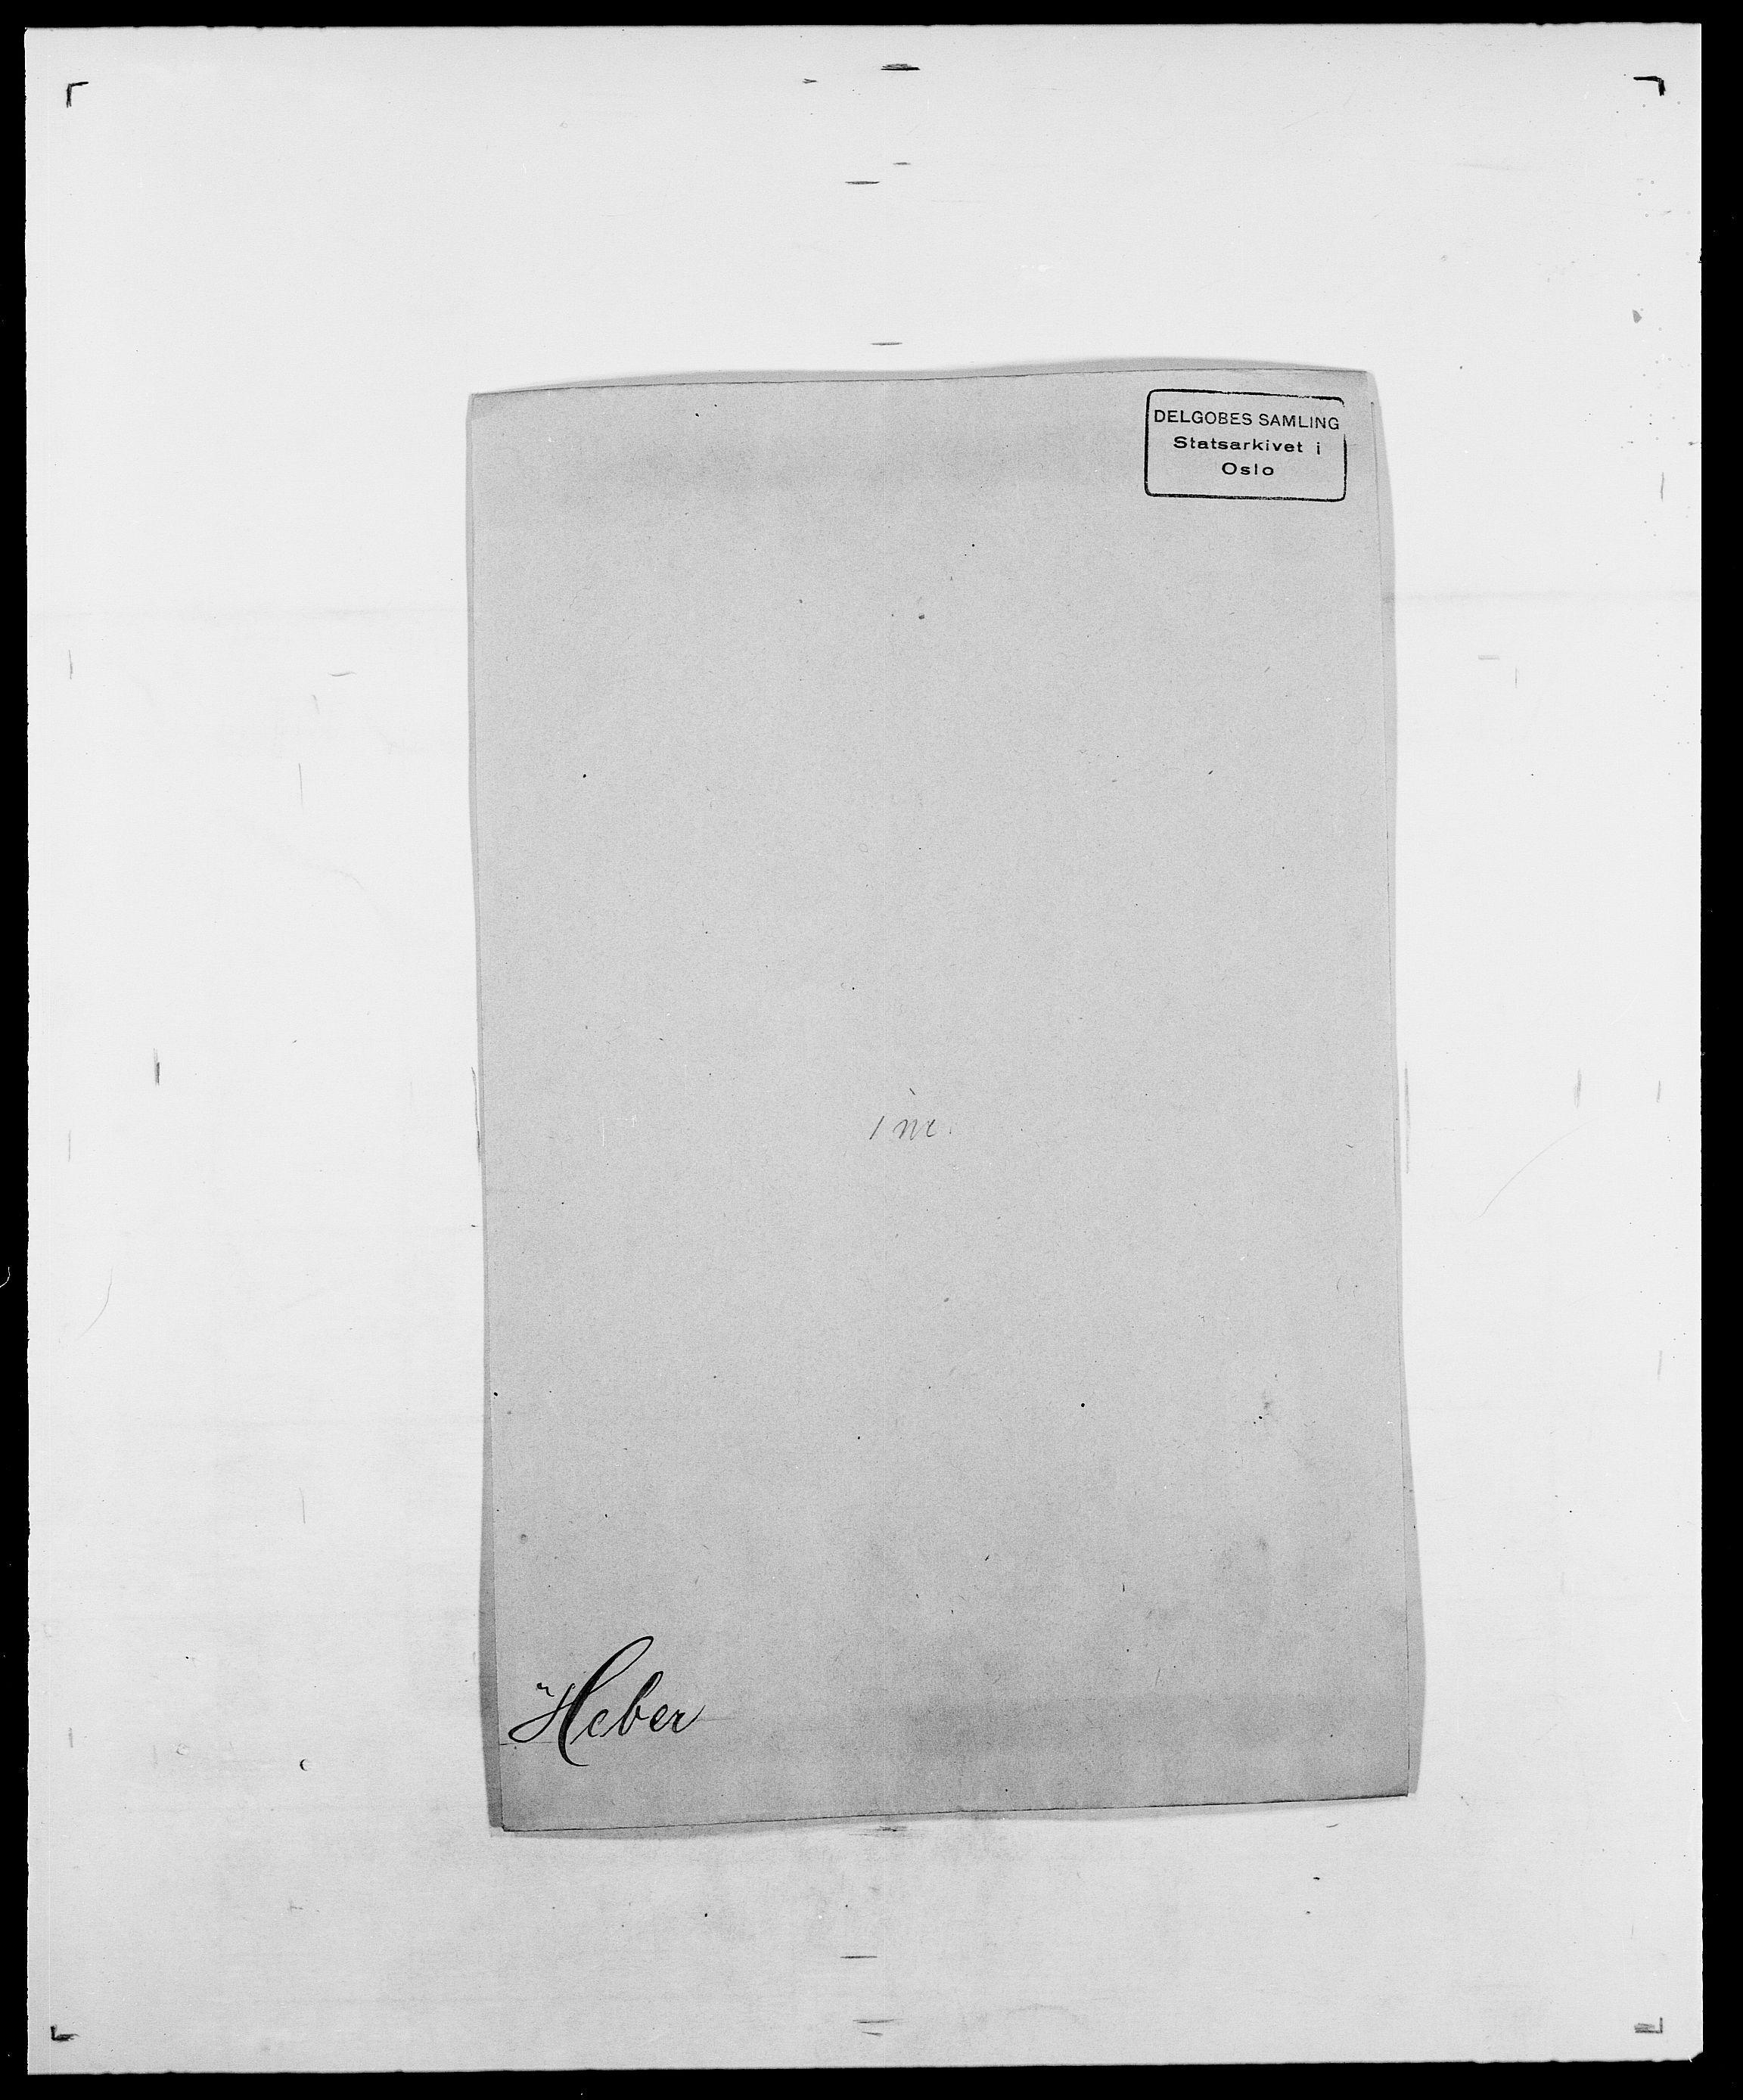 SAO, Delgobe, Charles Antoine - samling, D/Da/L0016: Hamborg - Hektoen, s. 651